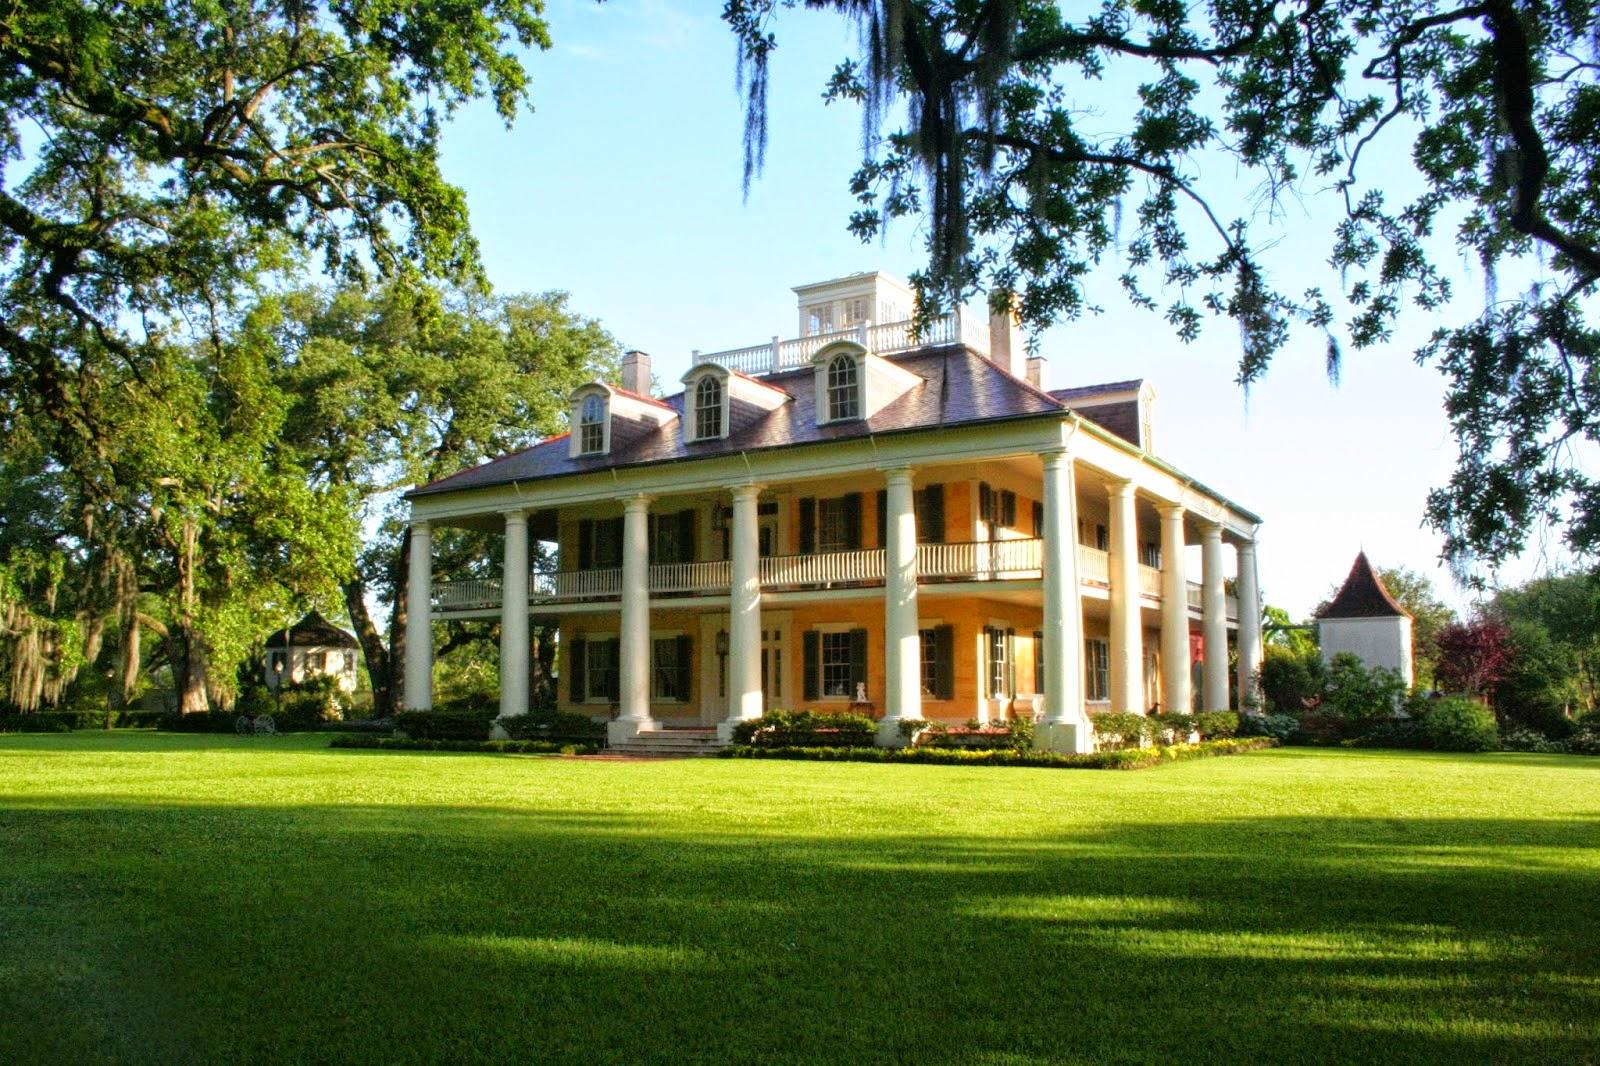 Danh lam thắng cảnh tại Baton Rouge